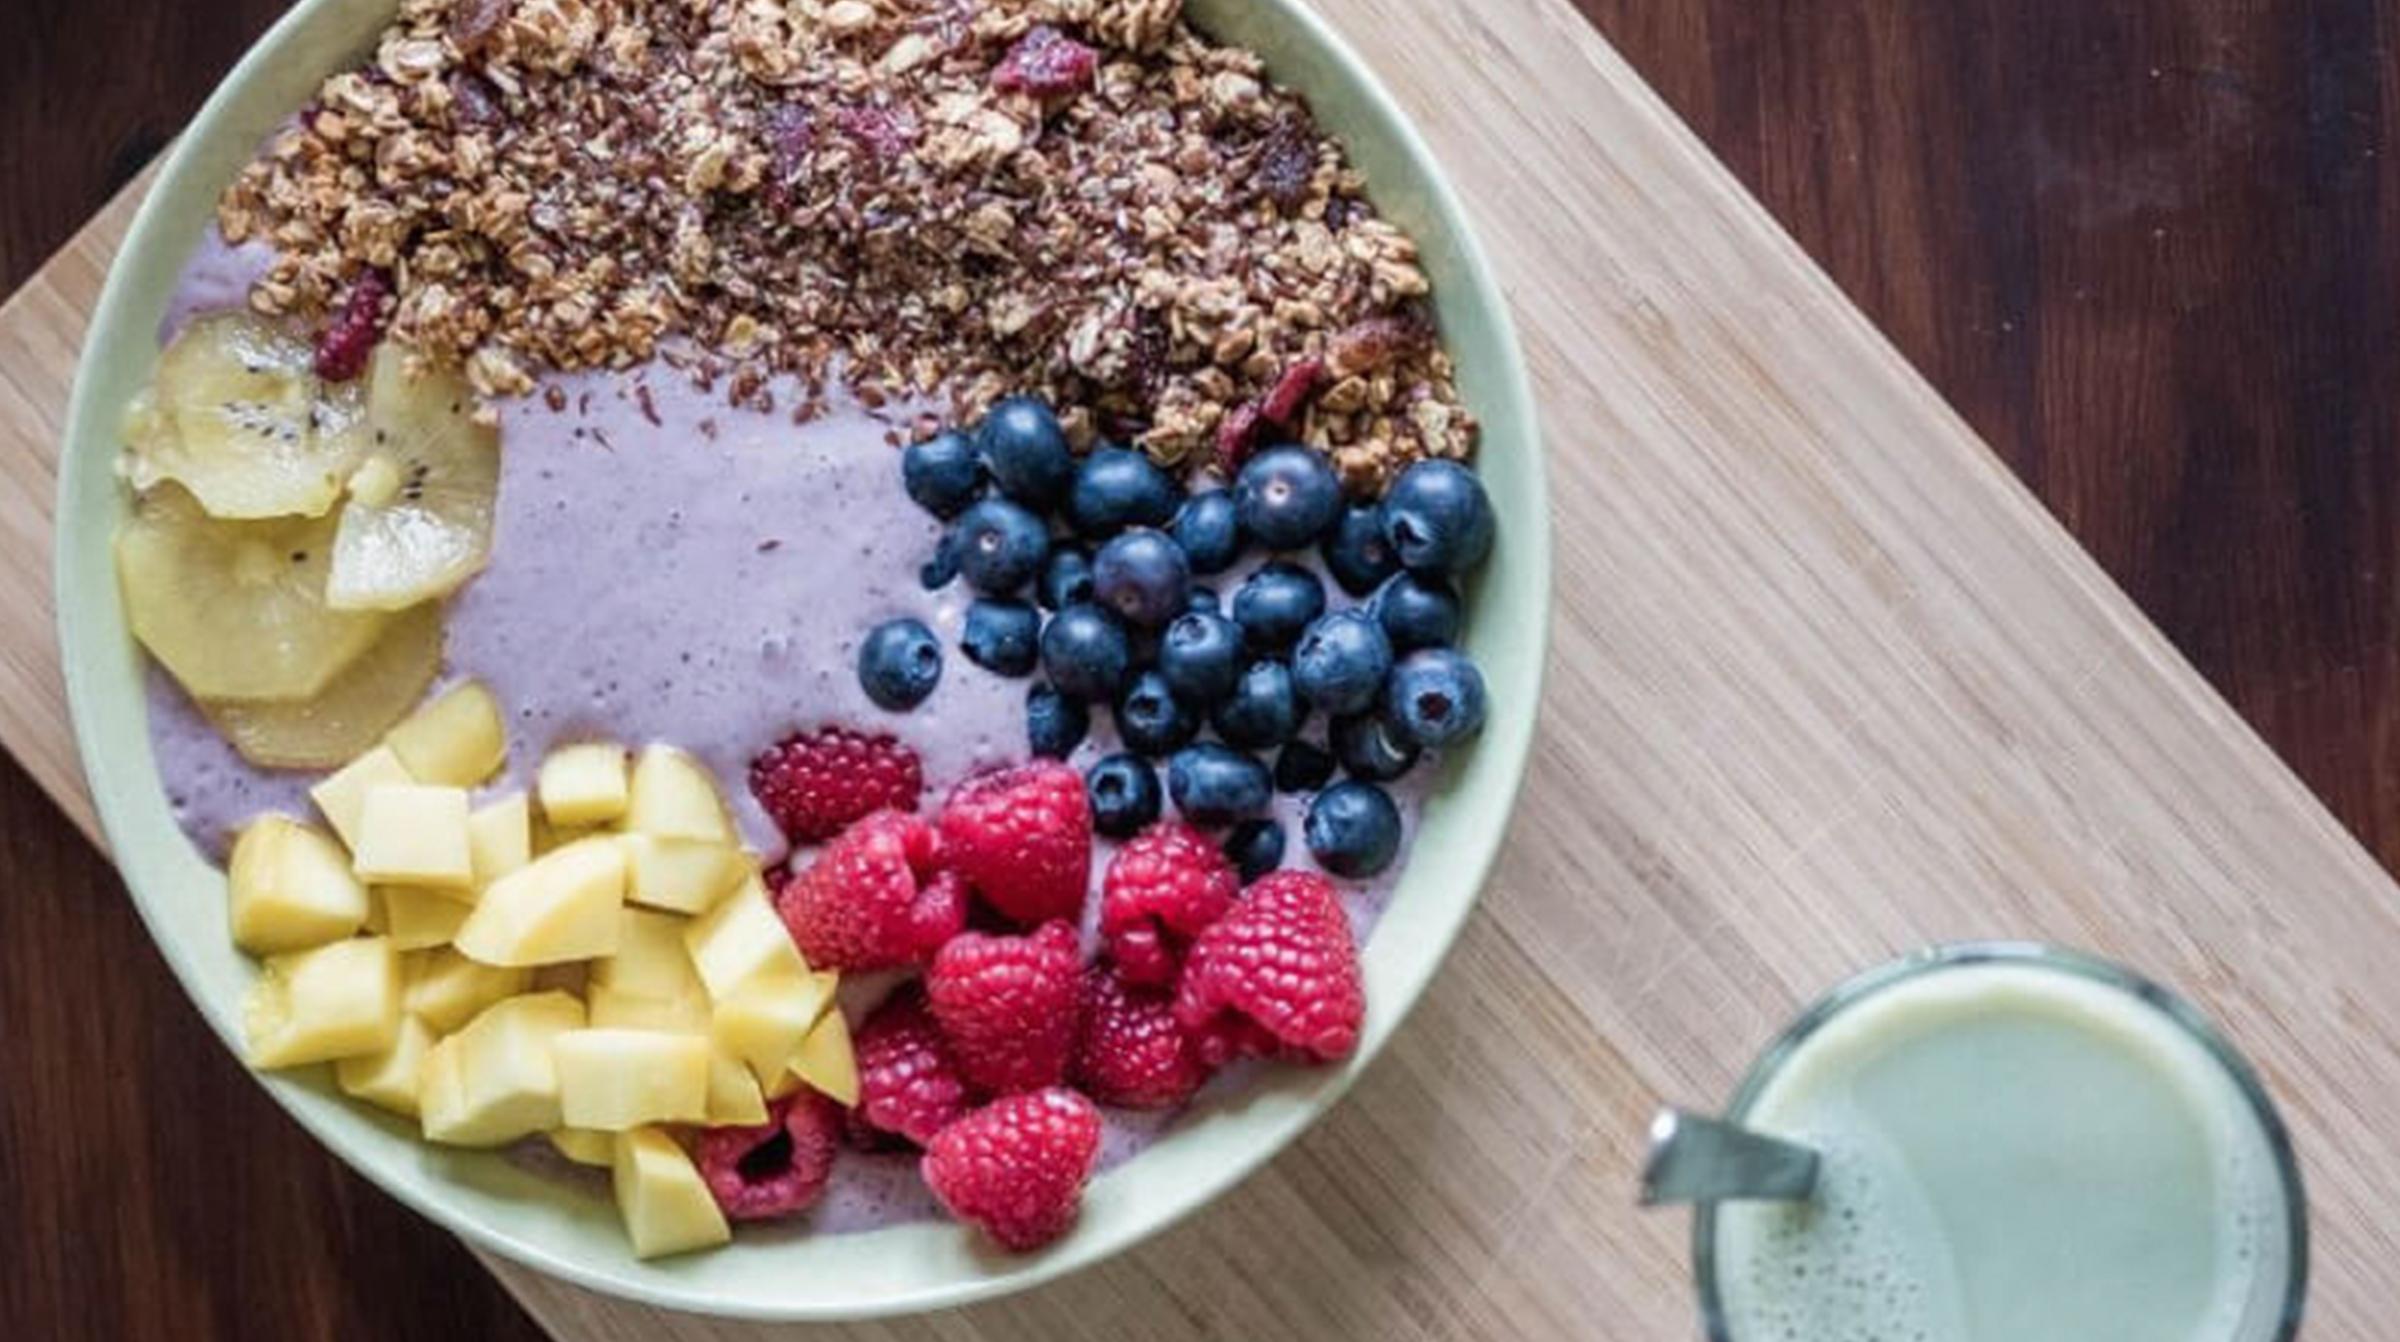 Gut Health and Kefir